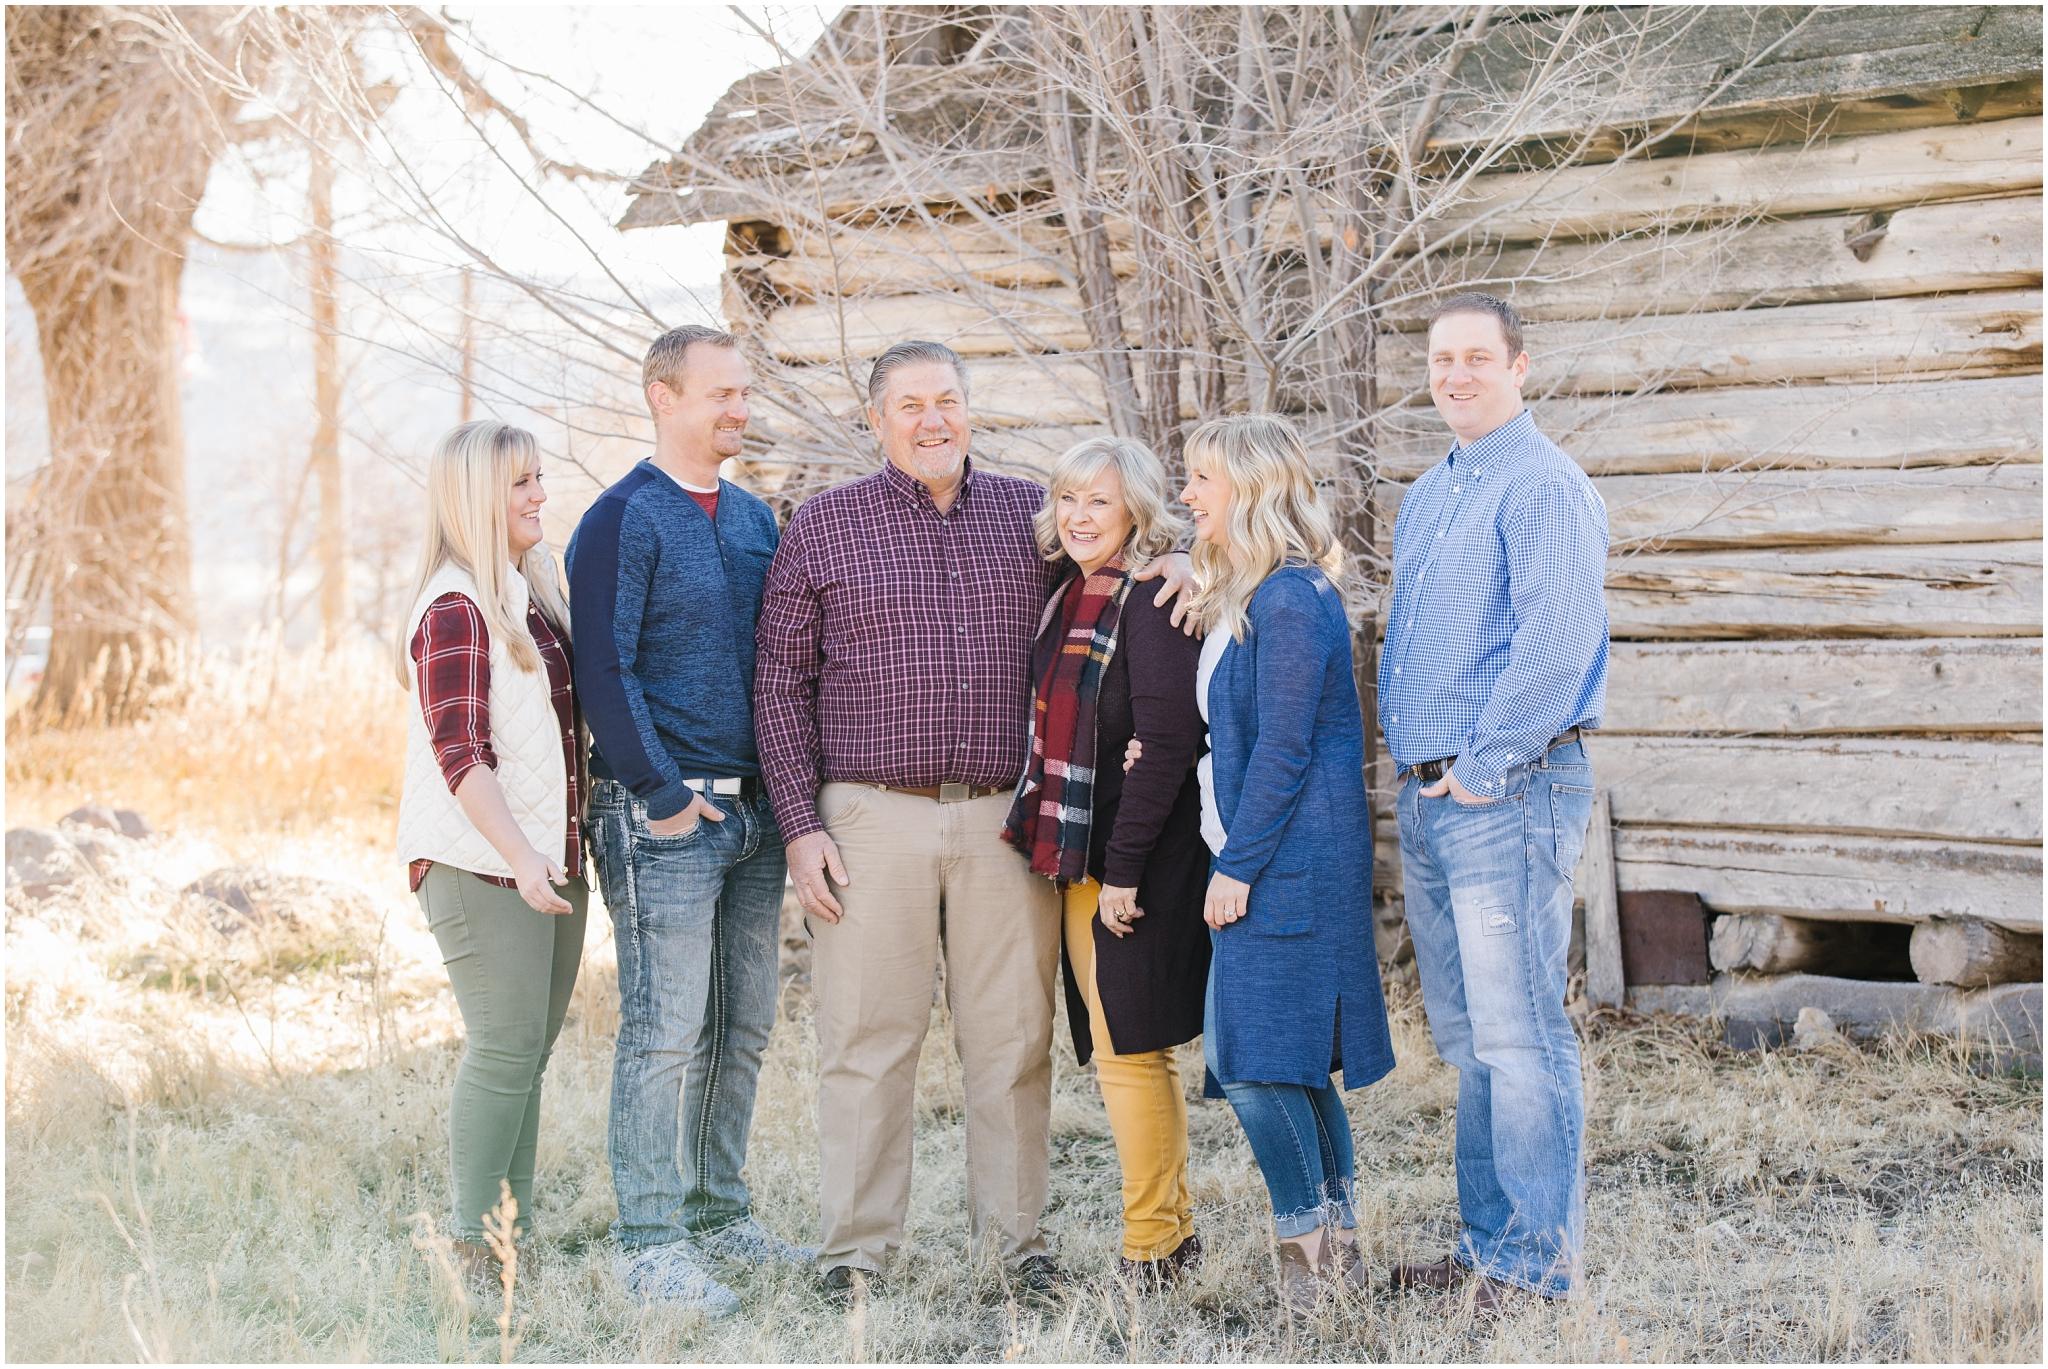 Laws-50_Lizzie-B-Imagery-Utah-Family-Photographer-Salt-Lake-City-Park-City-Davis-County-Clearfield.jpg